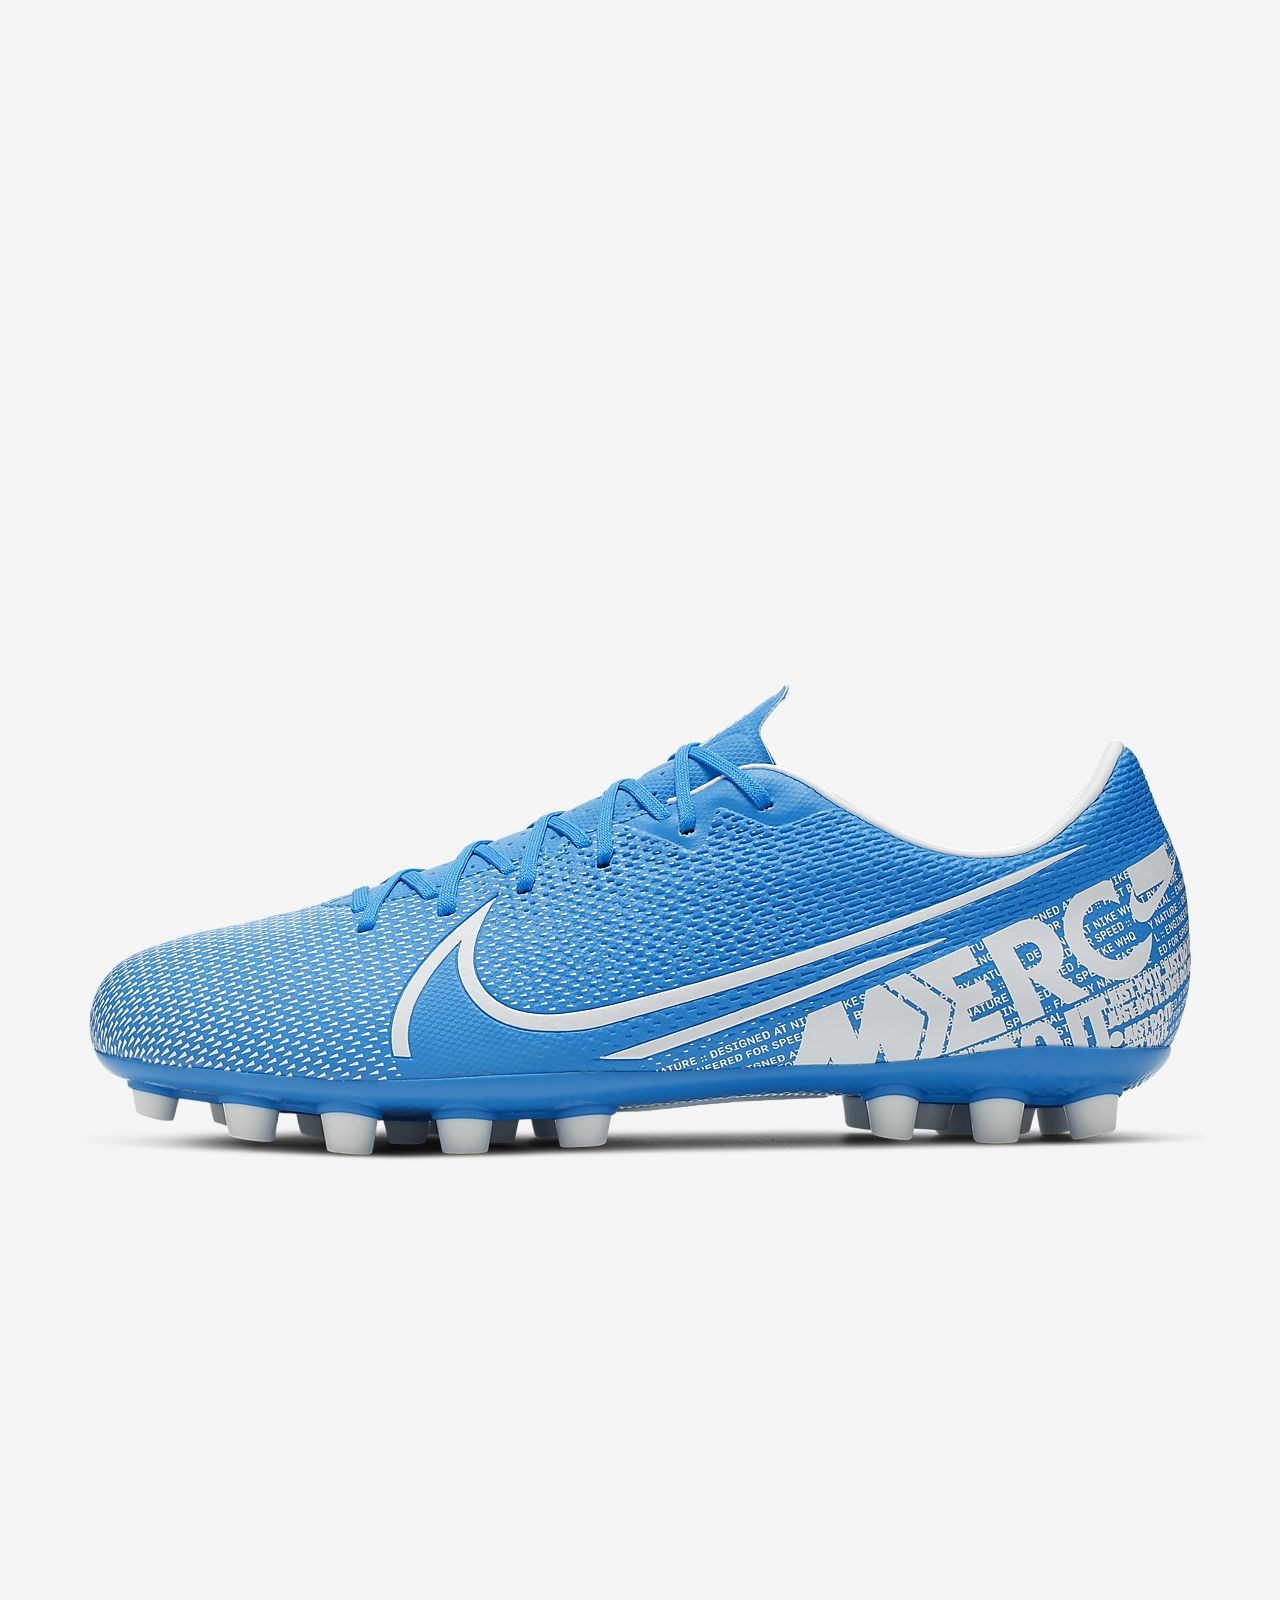 Kopačka na umělou trávu Nike Mercurial Vapor 13 Academy AG